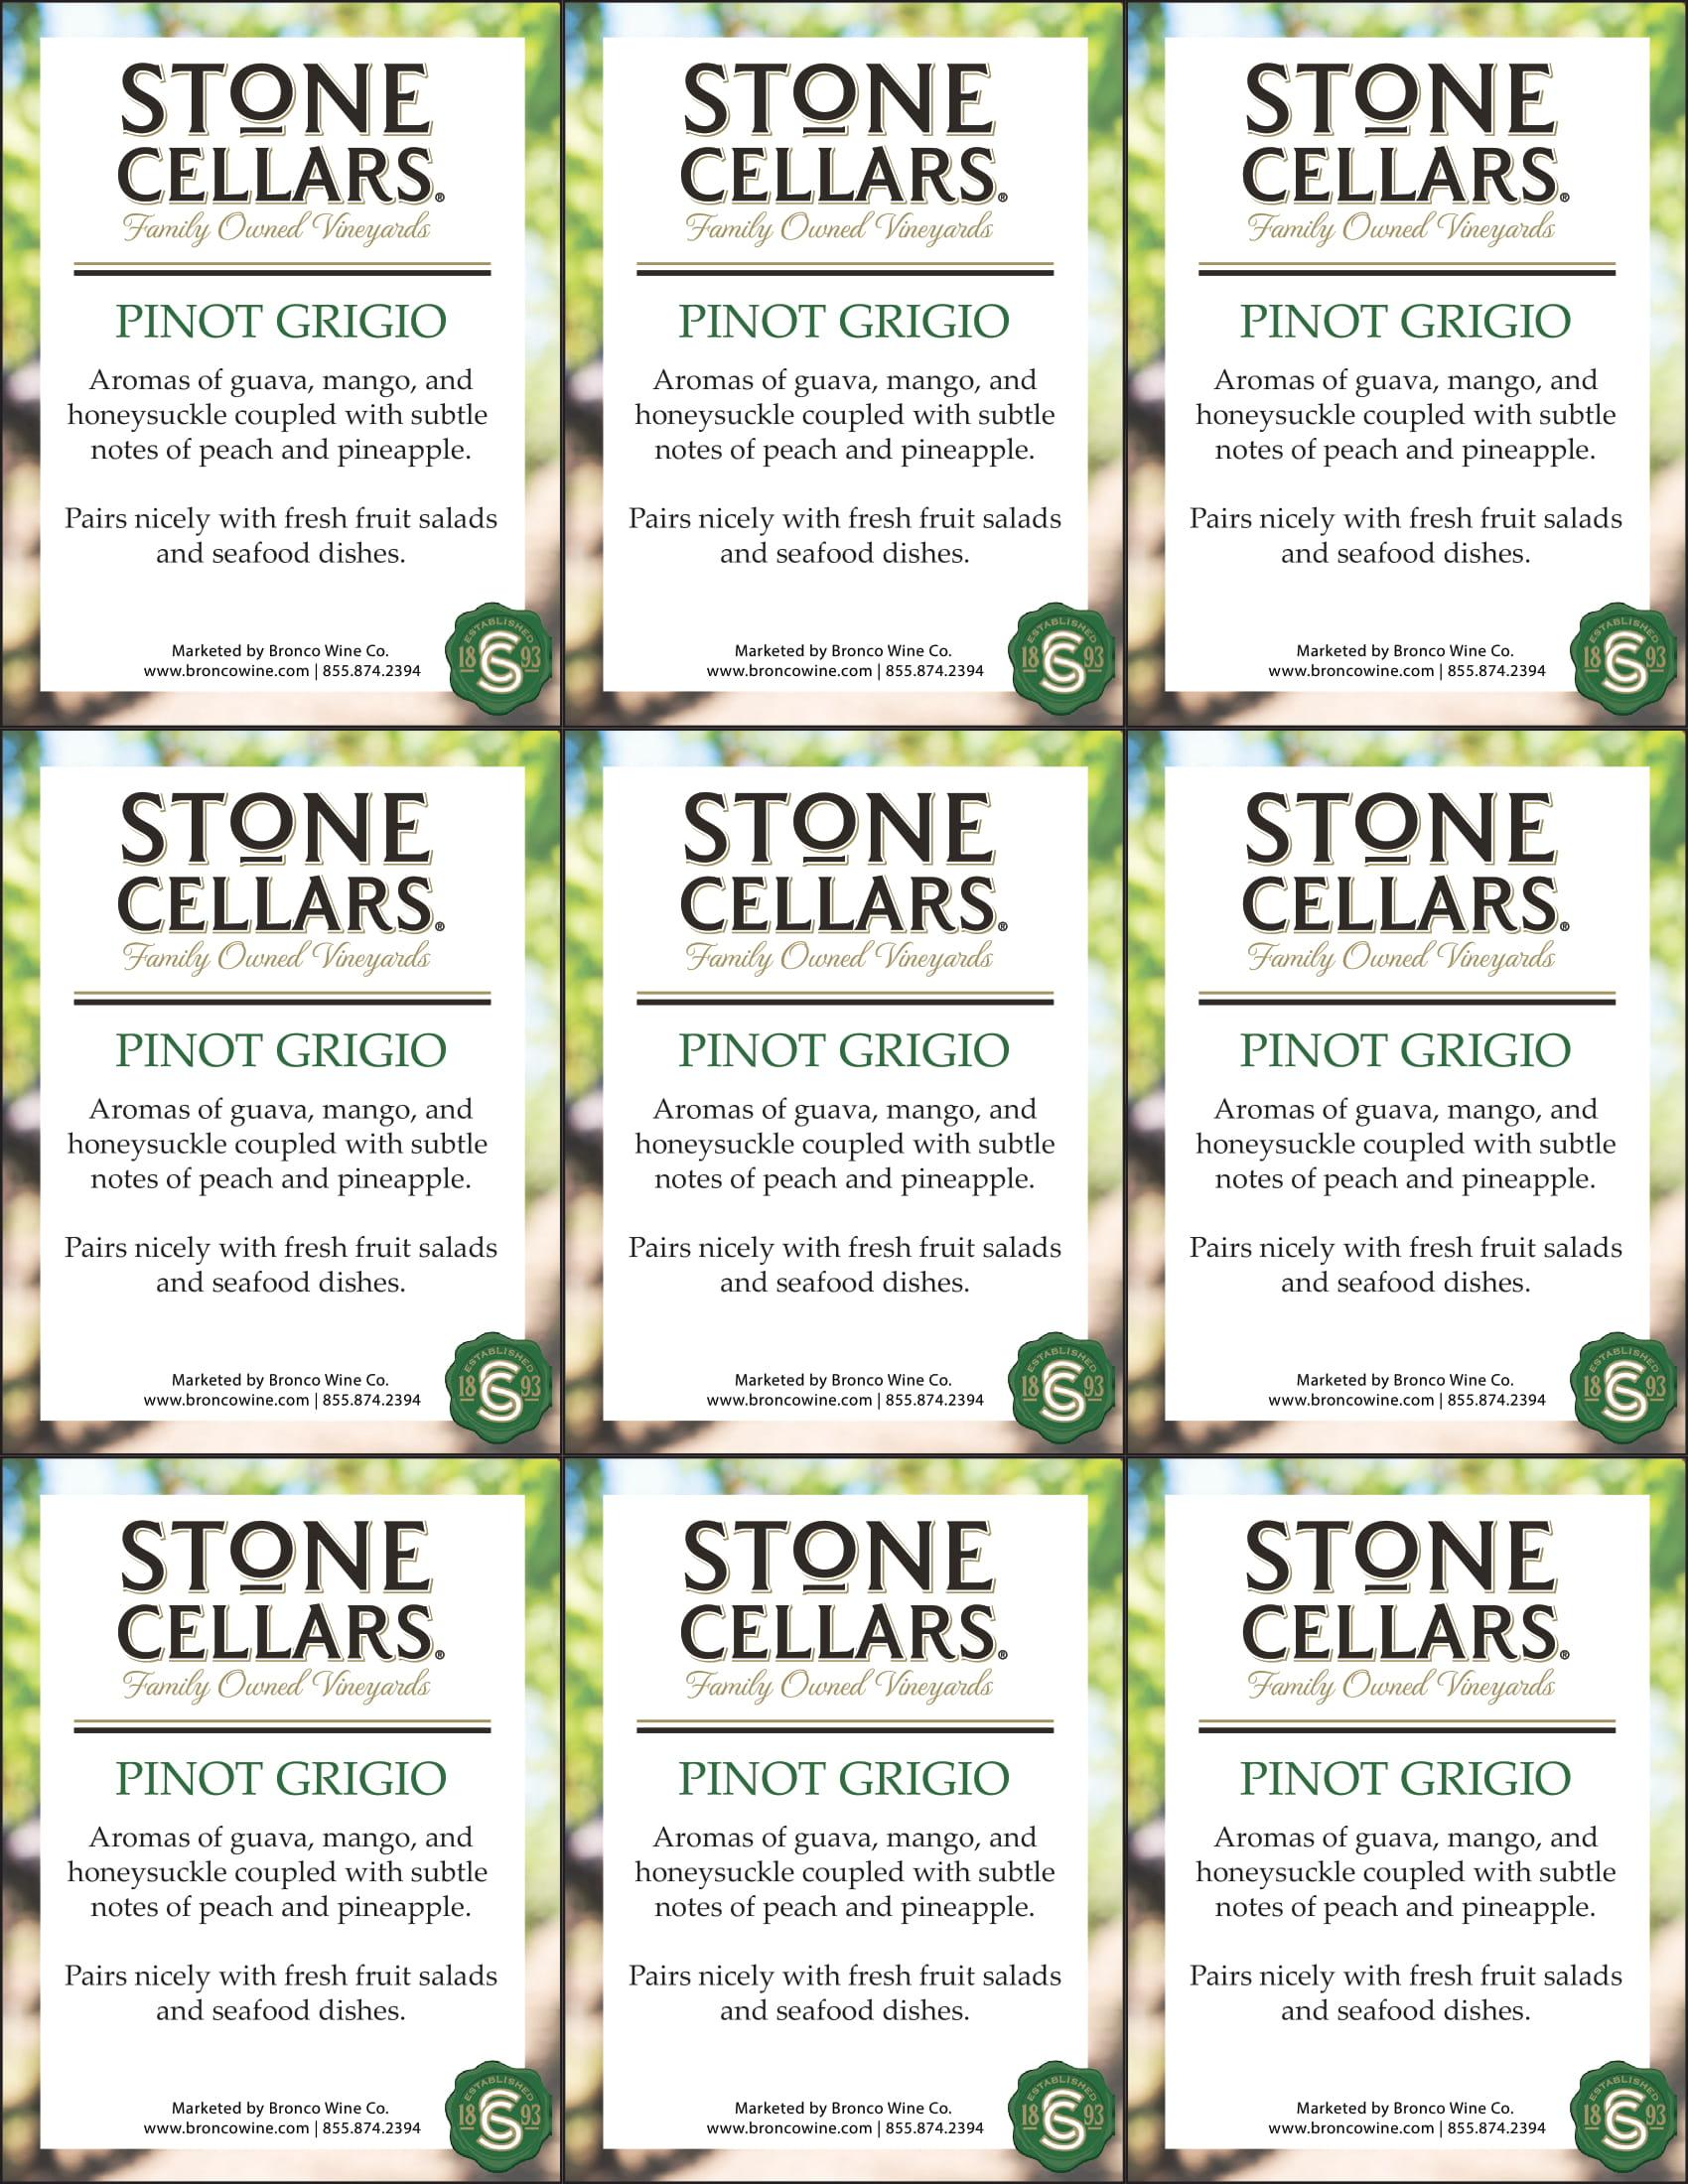 Stone Cellars Pinot Grigio Shelf Talker